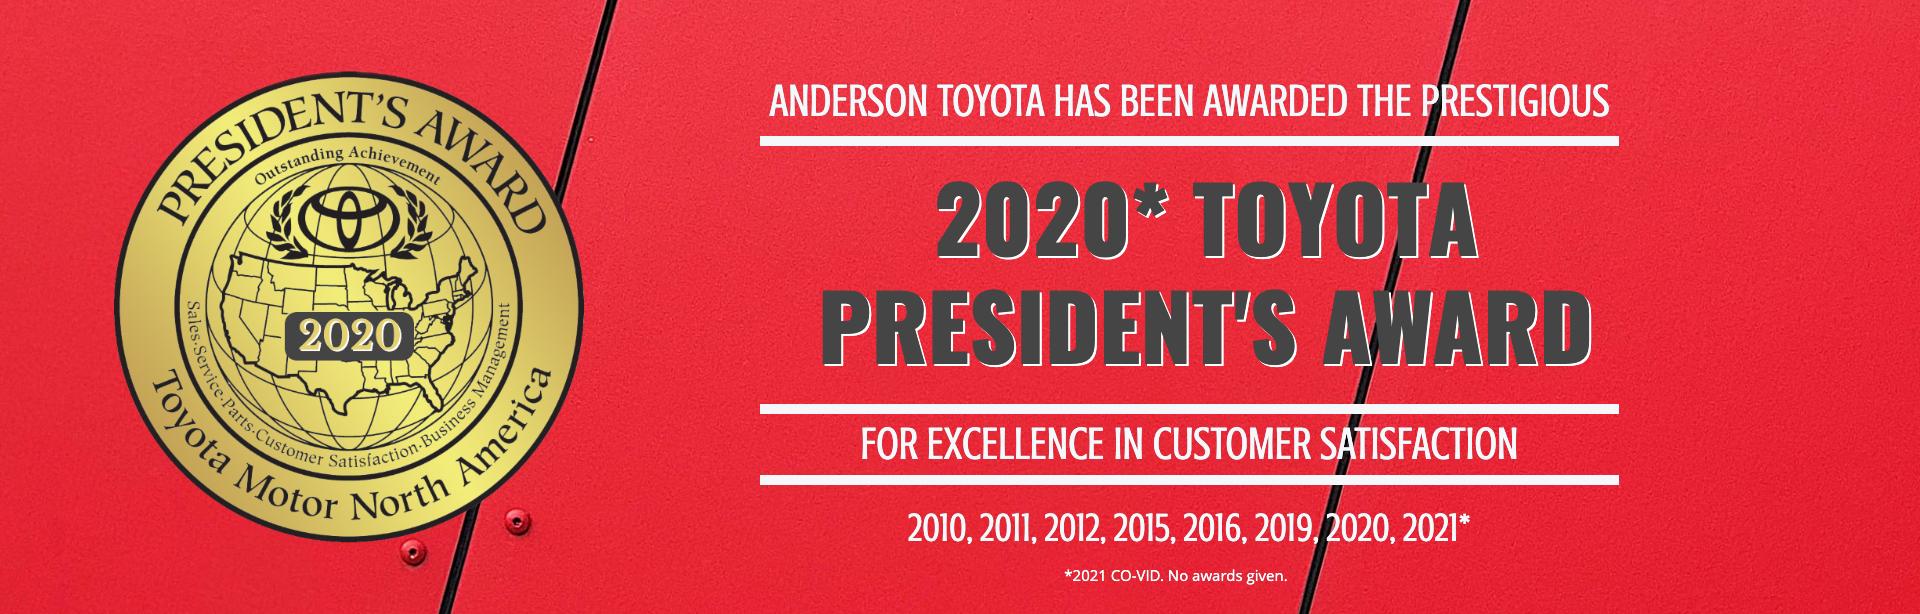 Anderson Toyota President's Award